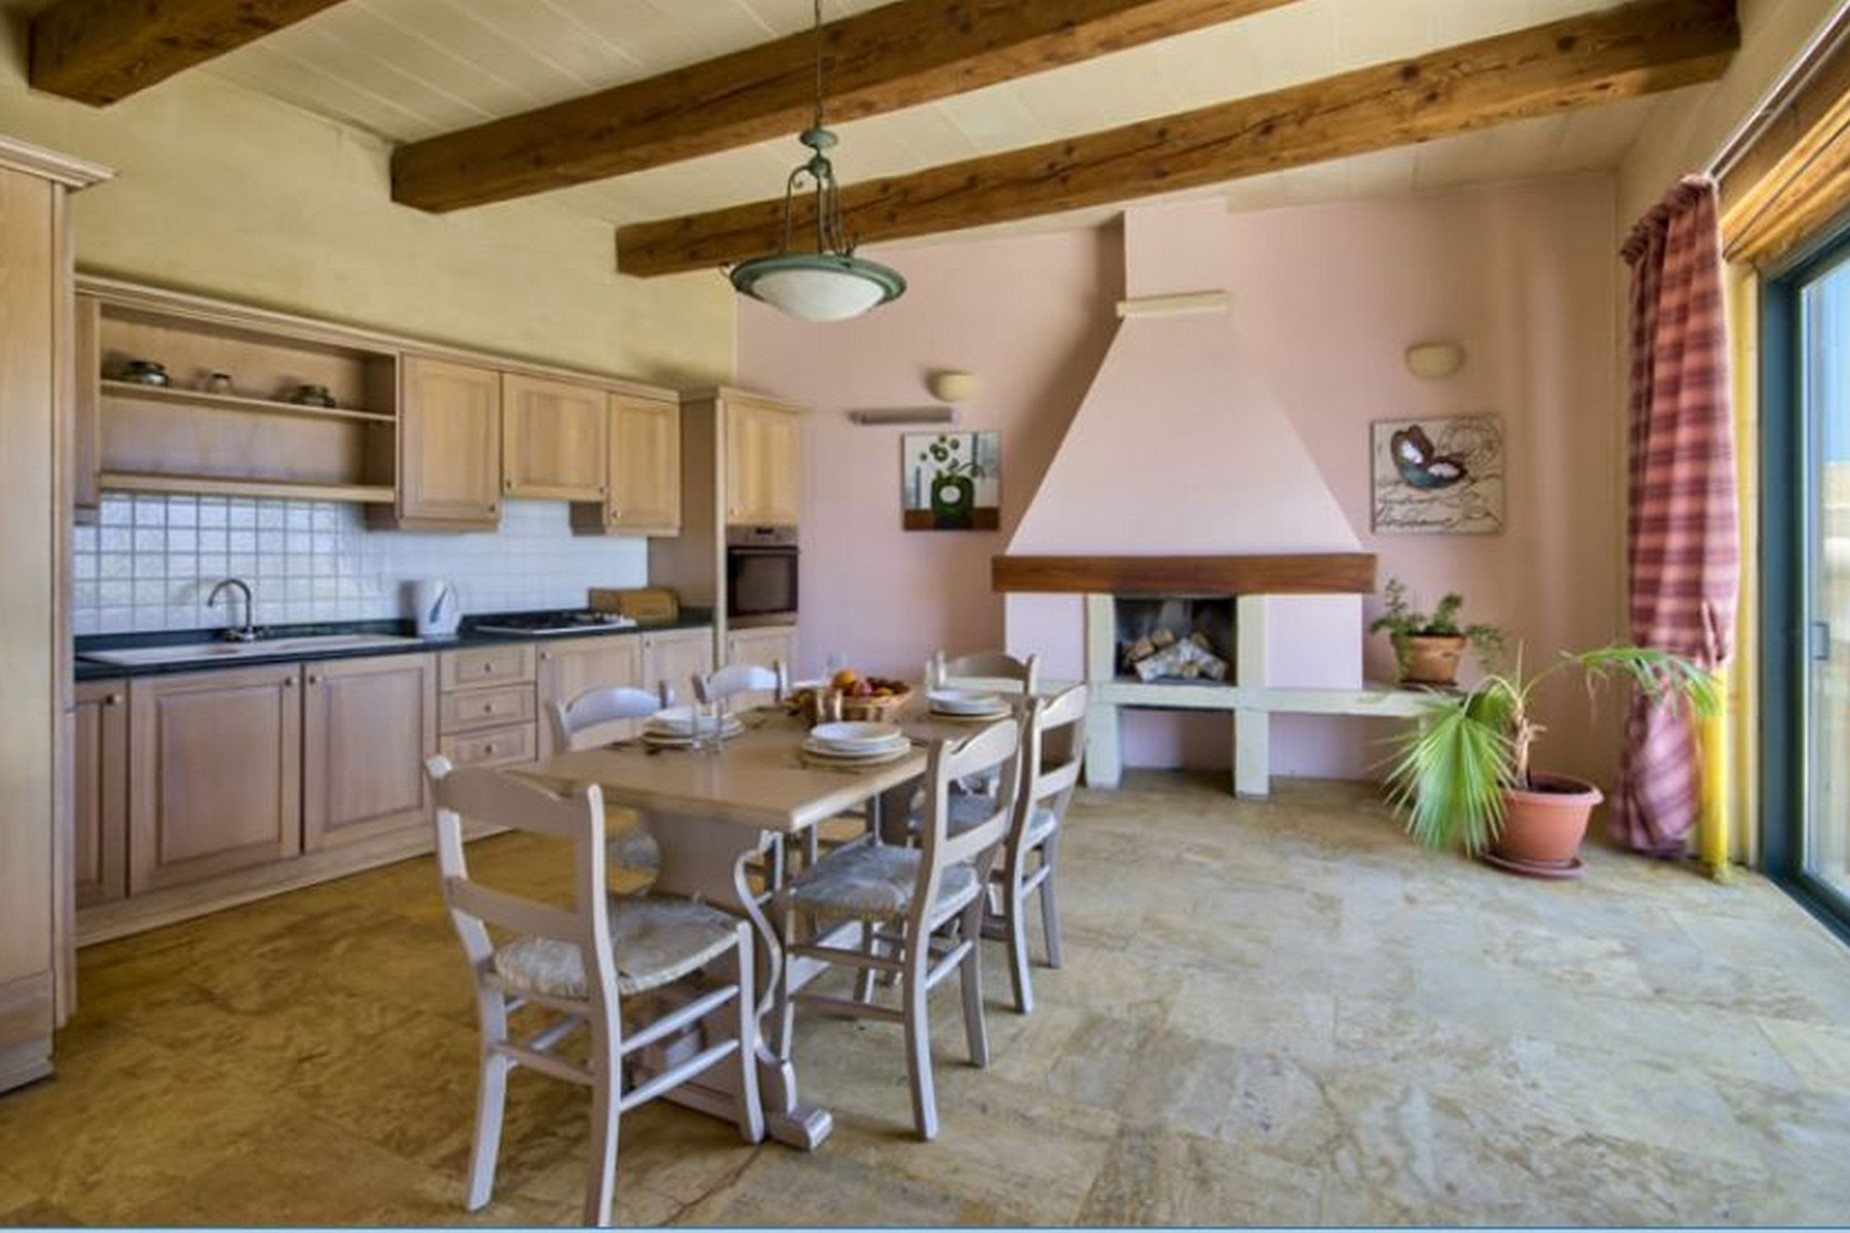 4 bed Farmhouse For Sale in Kercem, Kercem - thumb 7